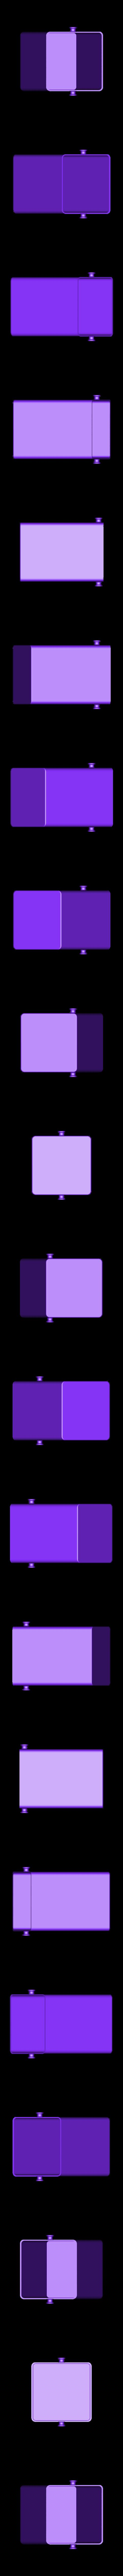 boite pince a linge.stl Download free STL file Laundry tongs box • 3D printable model, dsf